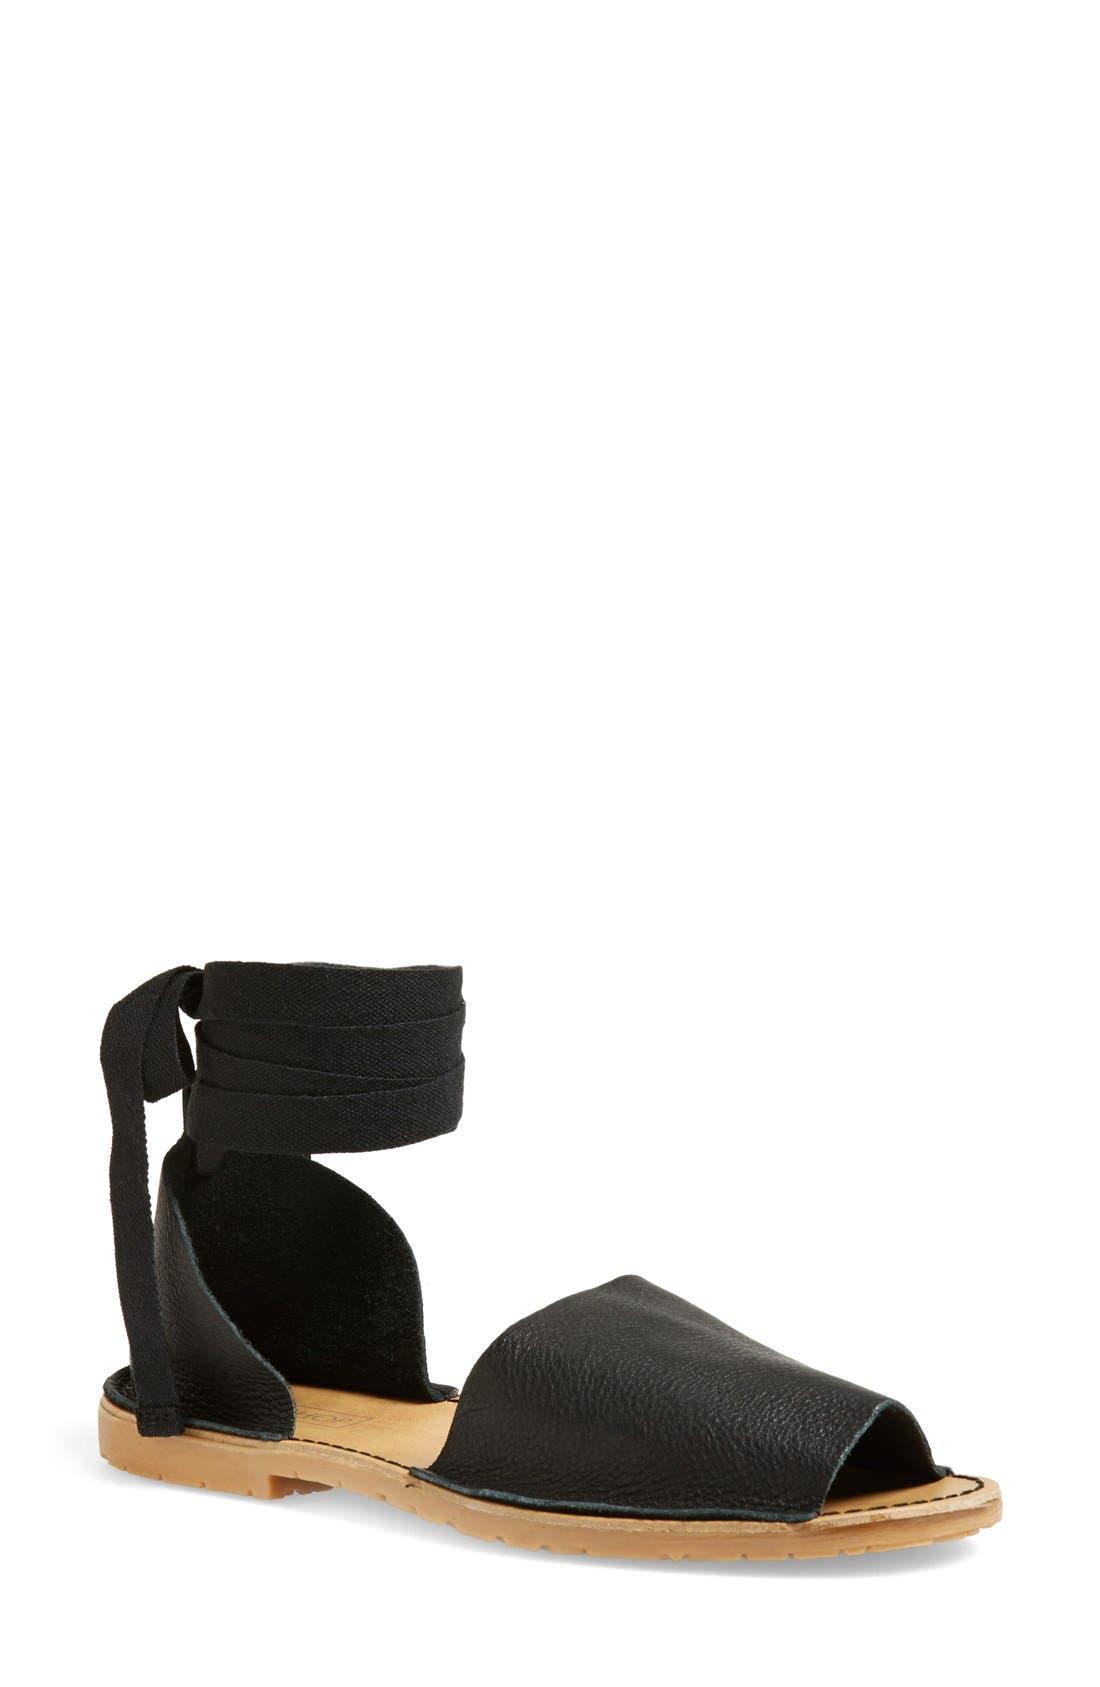 Main Image - Topshop 'Feline' Wraparound Ankle Strap Sandal (Women)